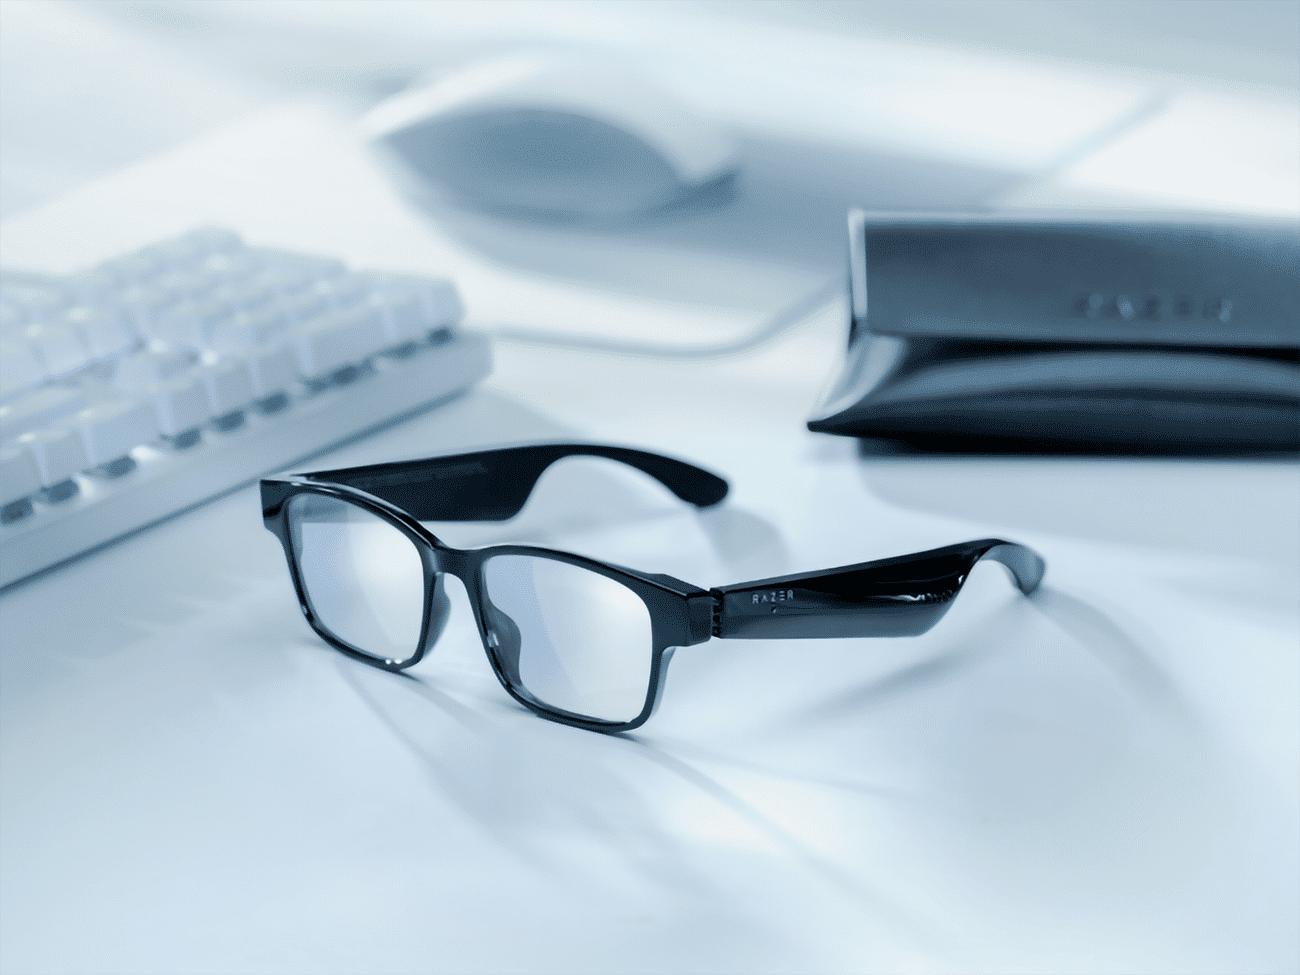 razer-anzu-lunettes-connectees